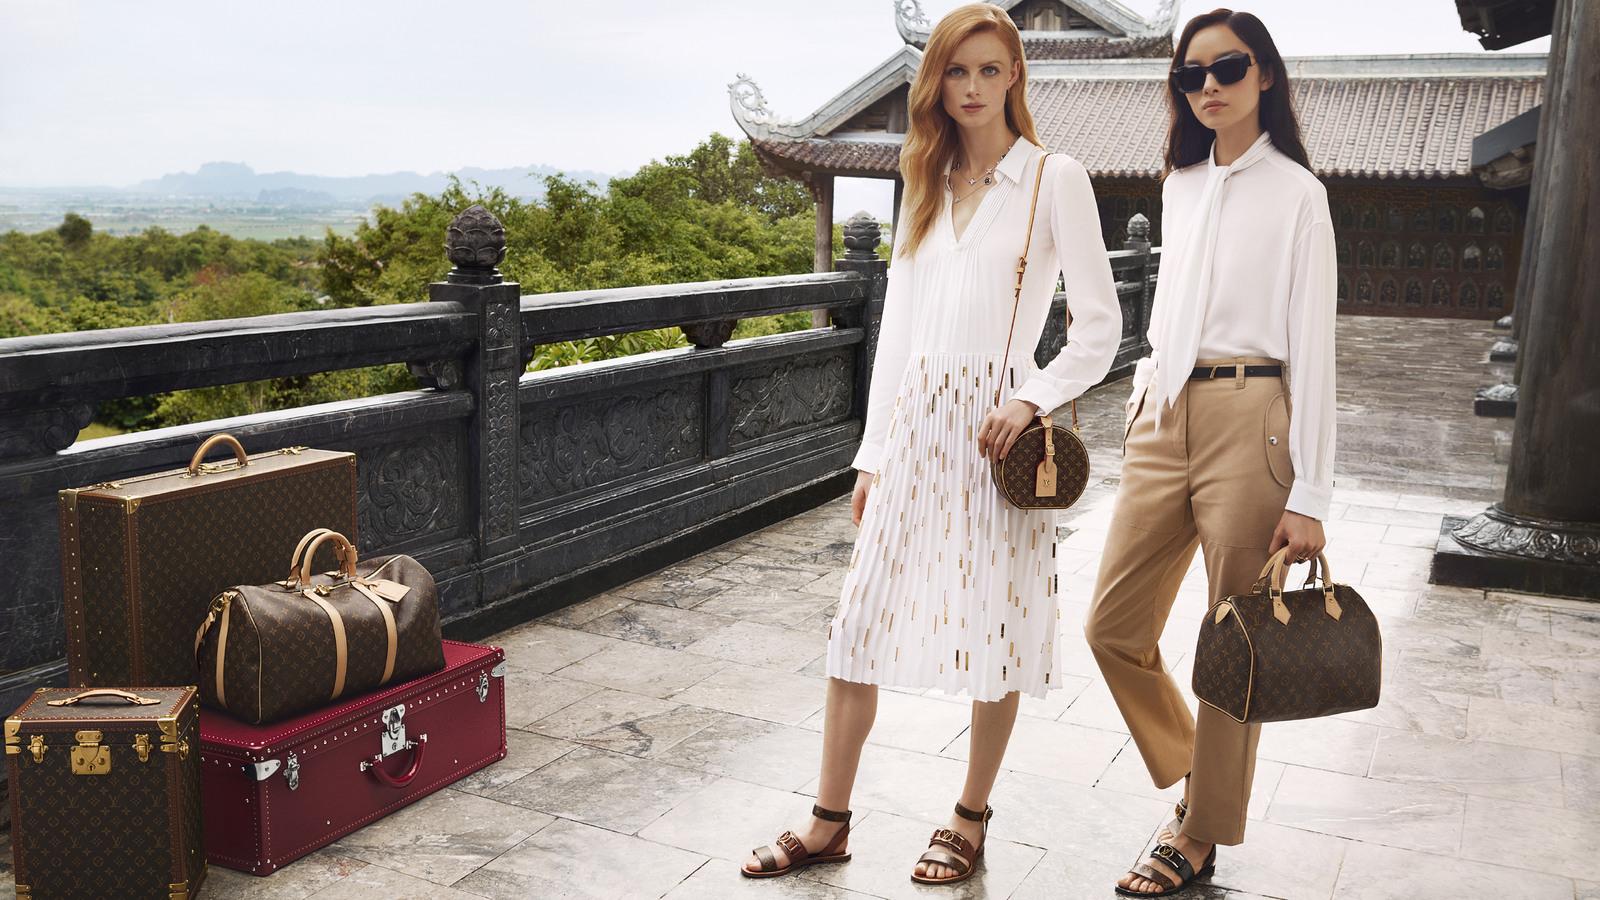 louis vuitton - 5 1568261404 - Việt Nam tuyệt đẹp trong quảng cáo mới của Louis Vuitton